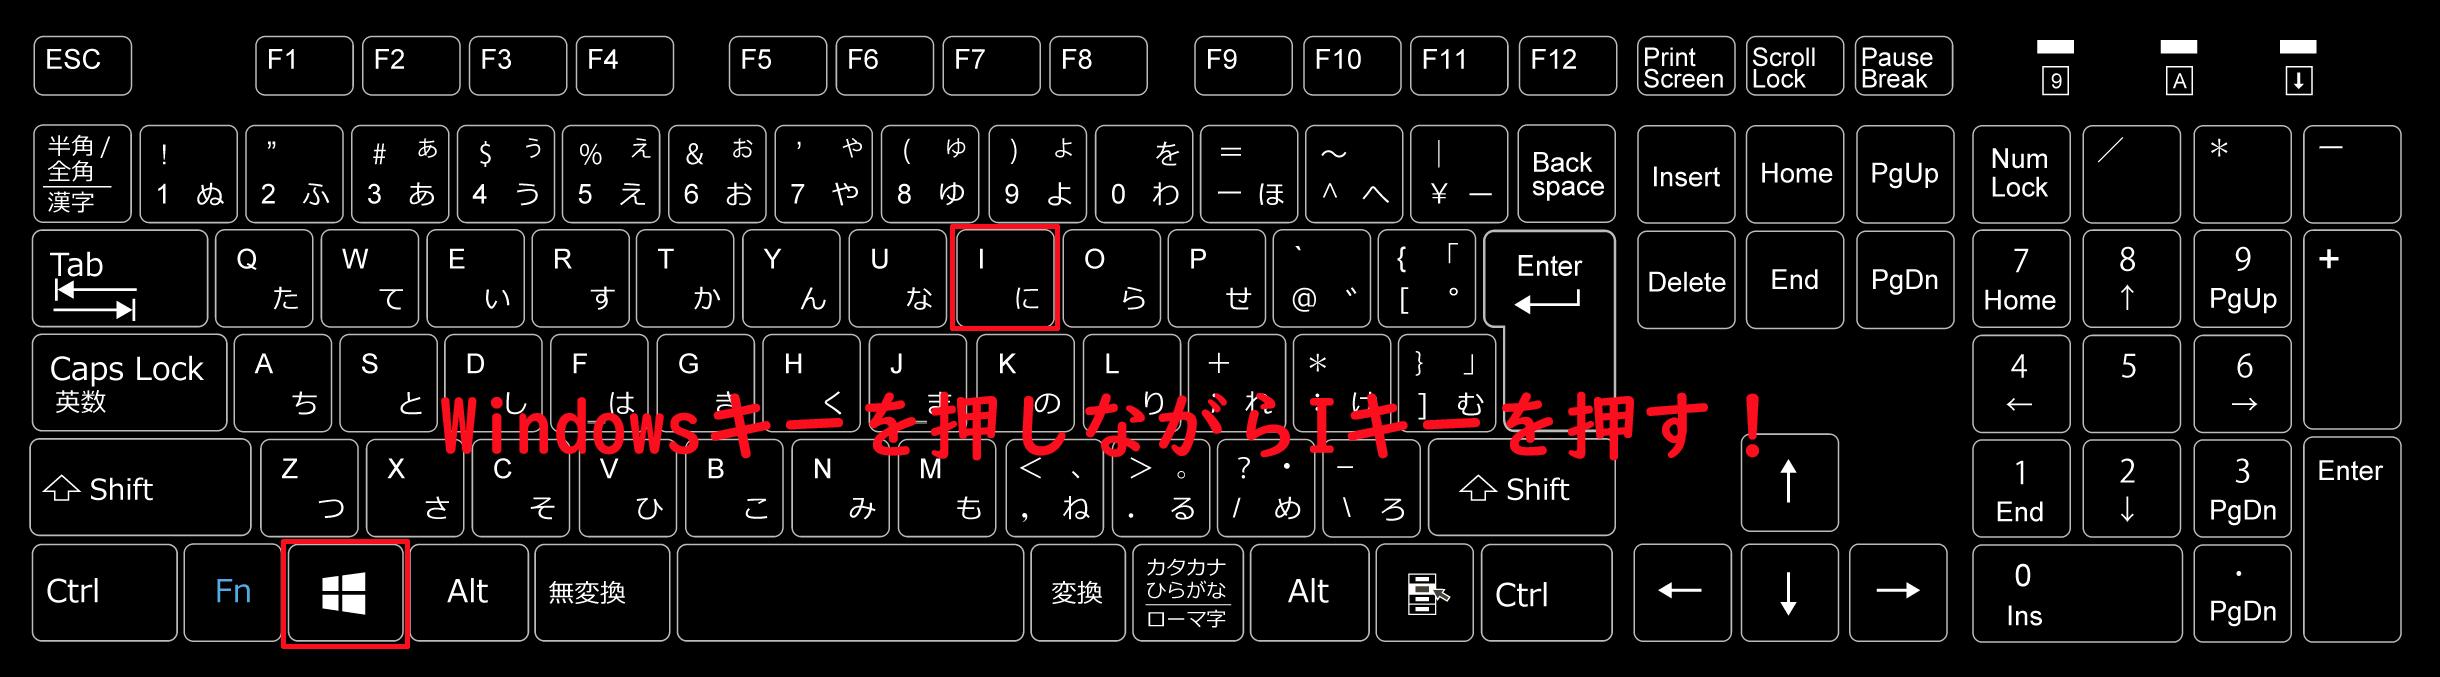 Windows10でWindowsの設定画面を開くにはWindowsキーを押しながらIキーを押す!